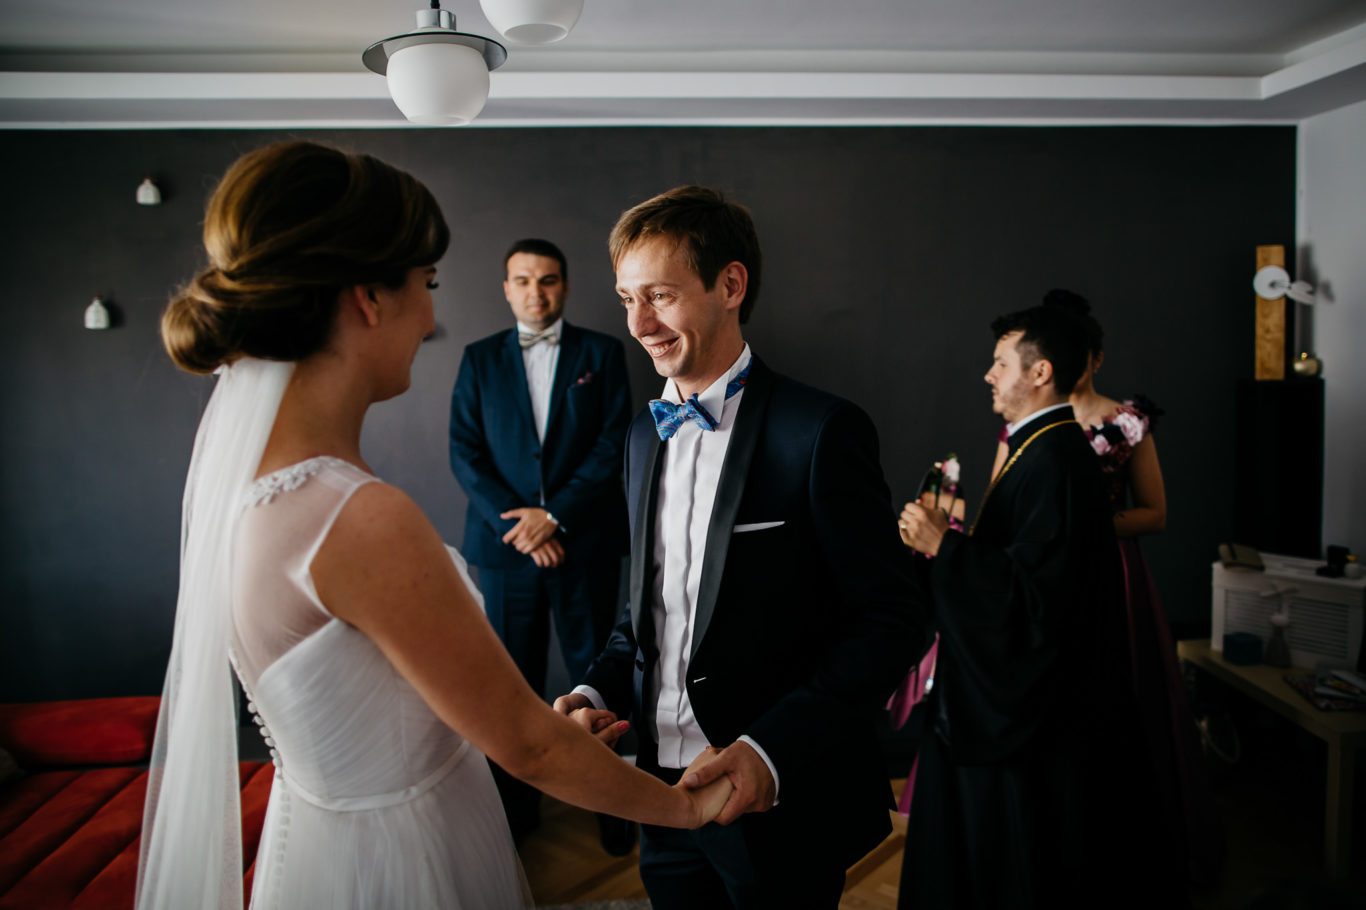 0163-Fotografie-nunta-Bucuresti-Oana-Catalin-fotograf-Ciprian-Dumitrescu-DCF_1851